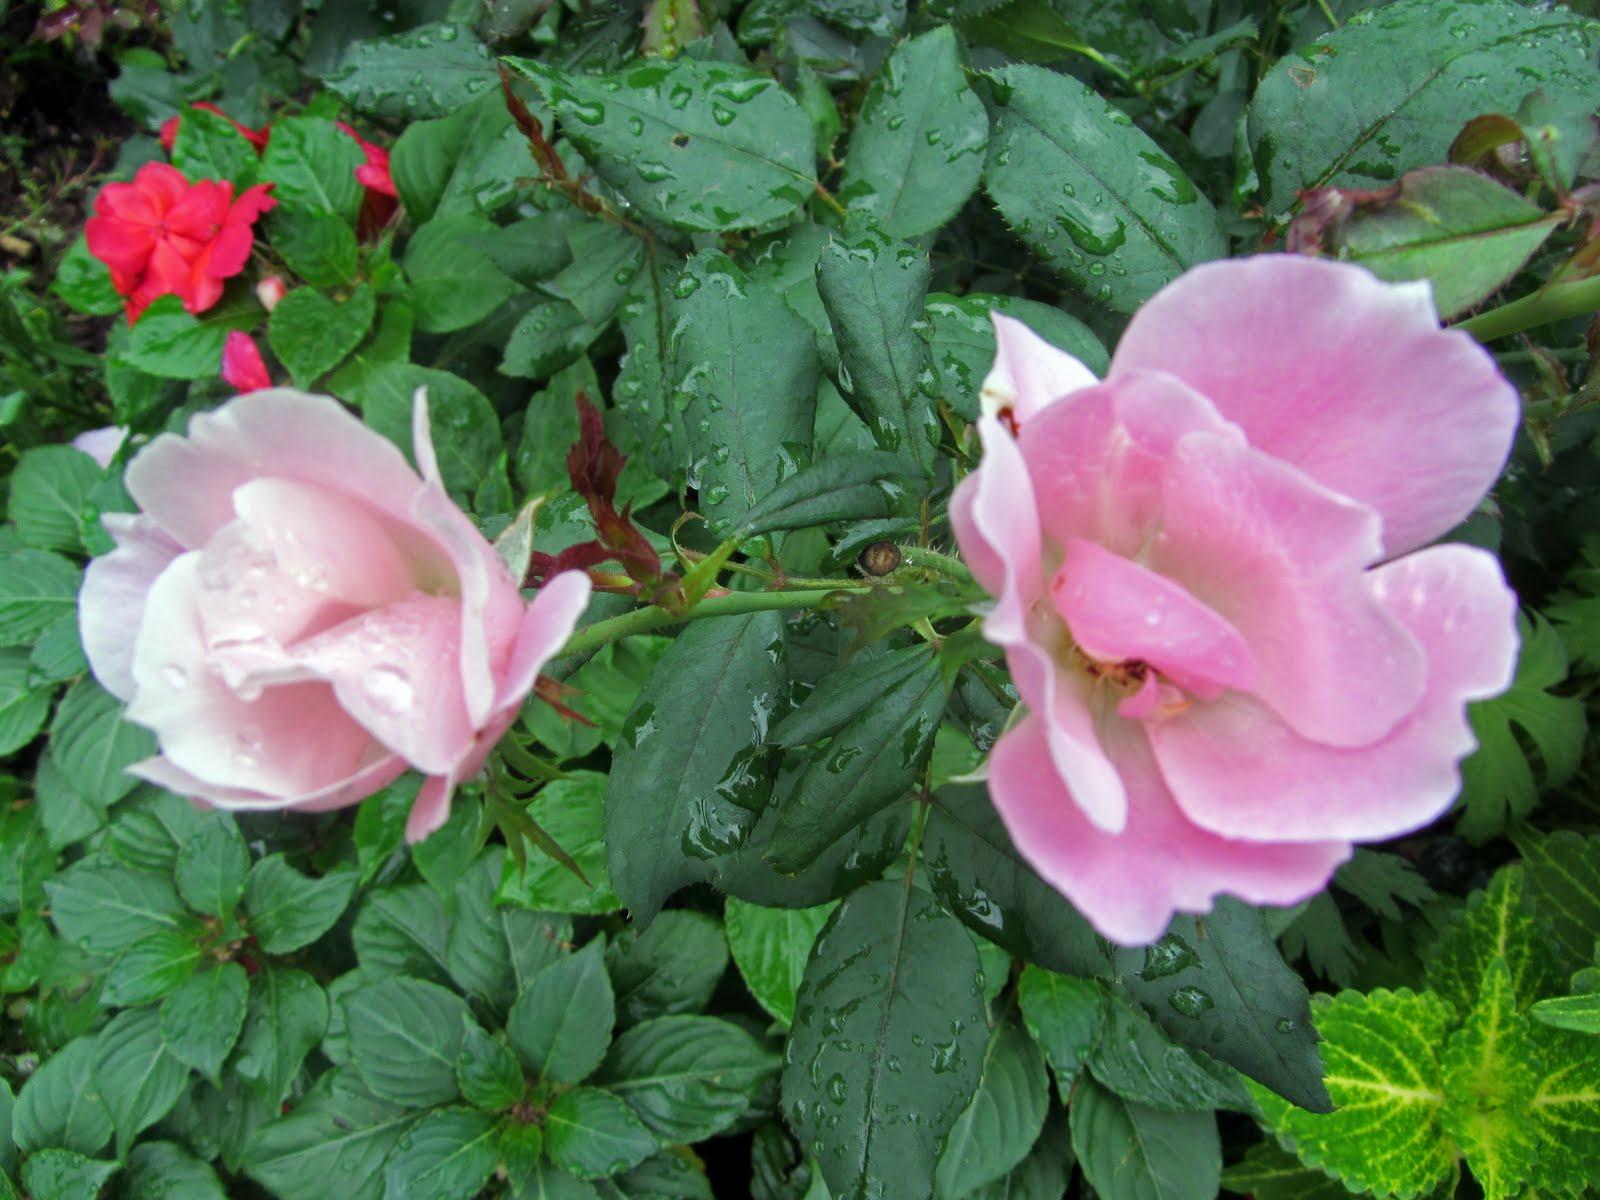 Roses In Garden: Gatsbys Gardens: A Summer Report Card